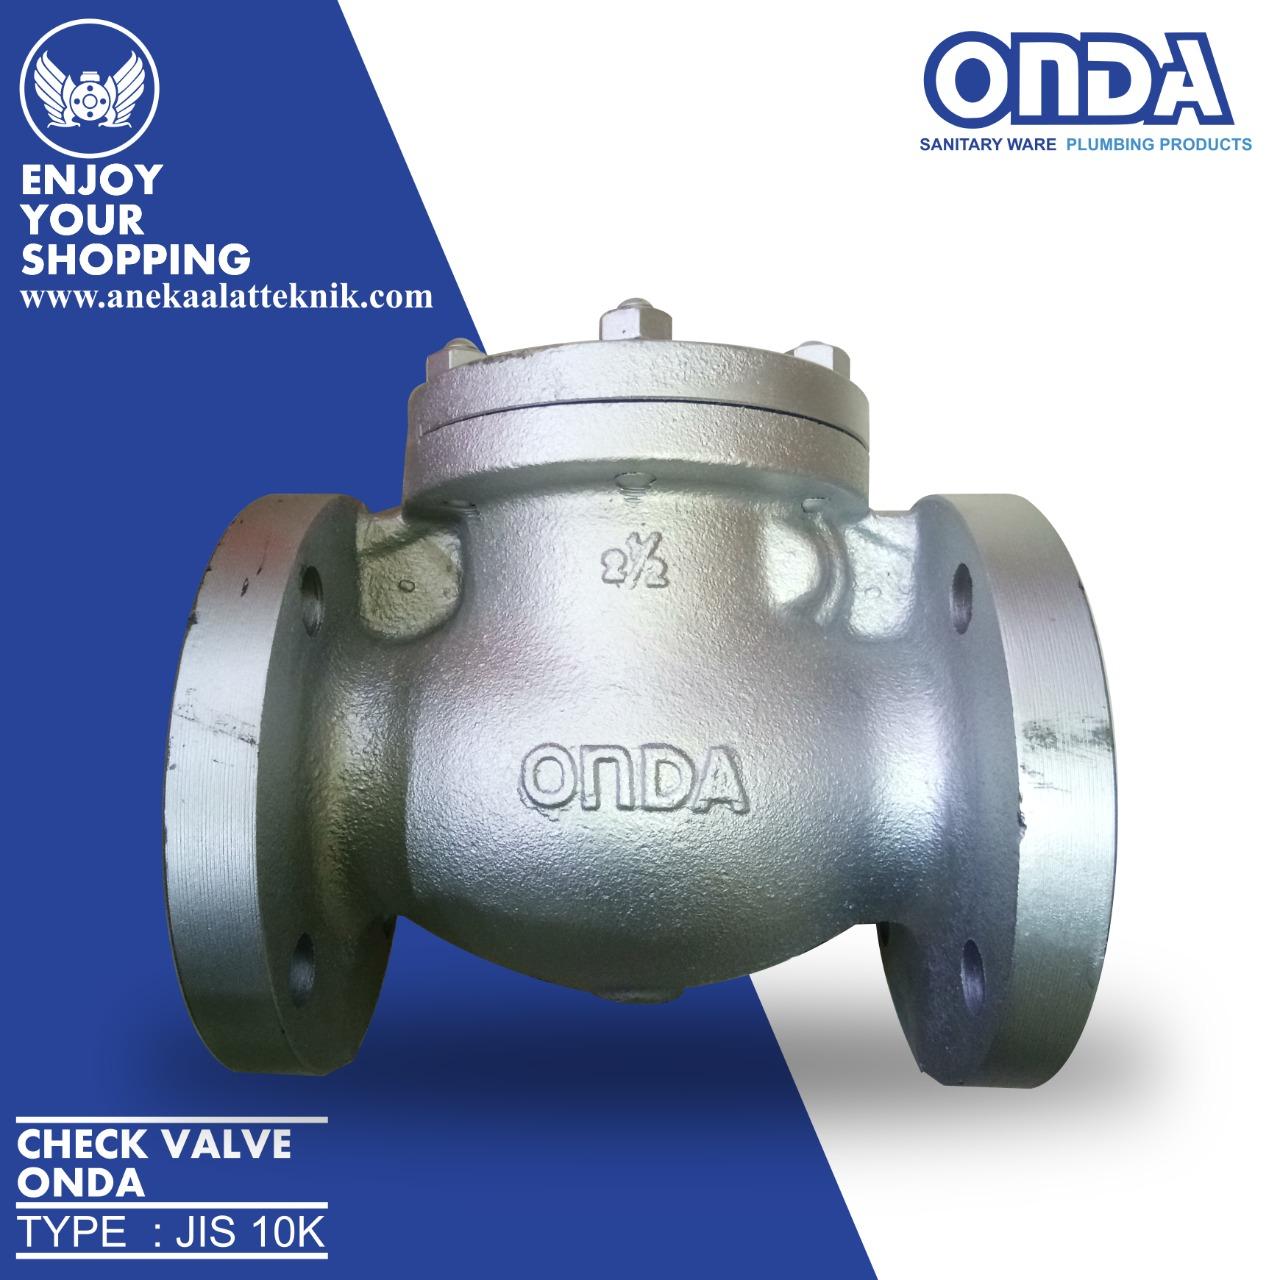 Check valve onda